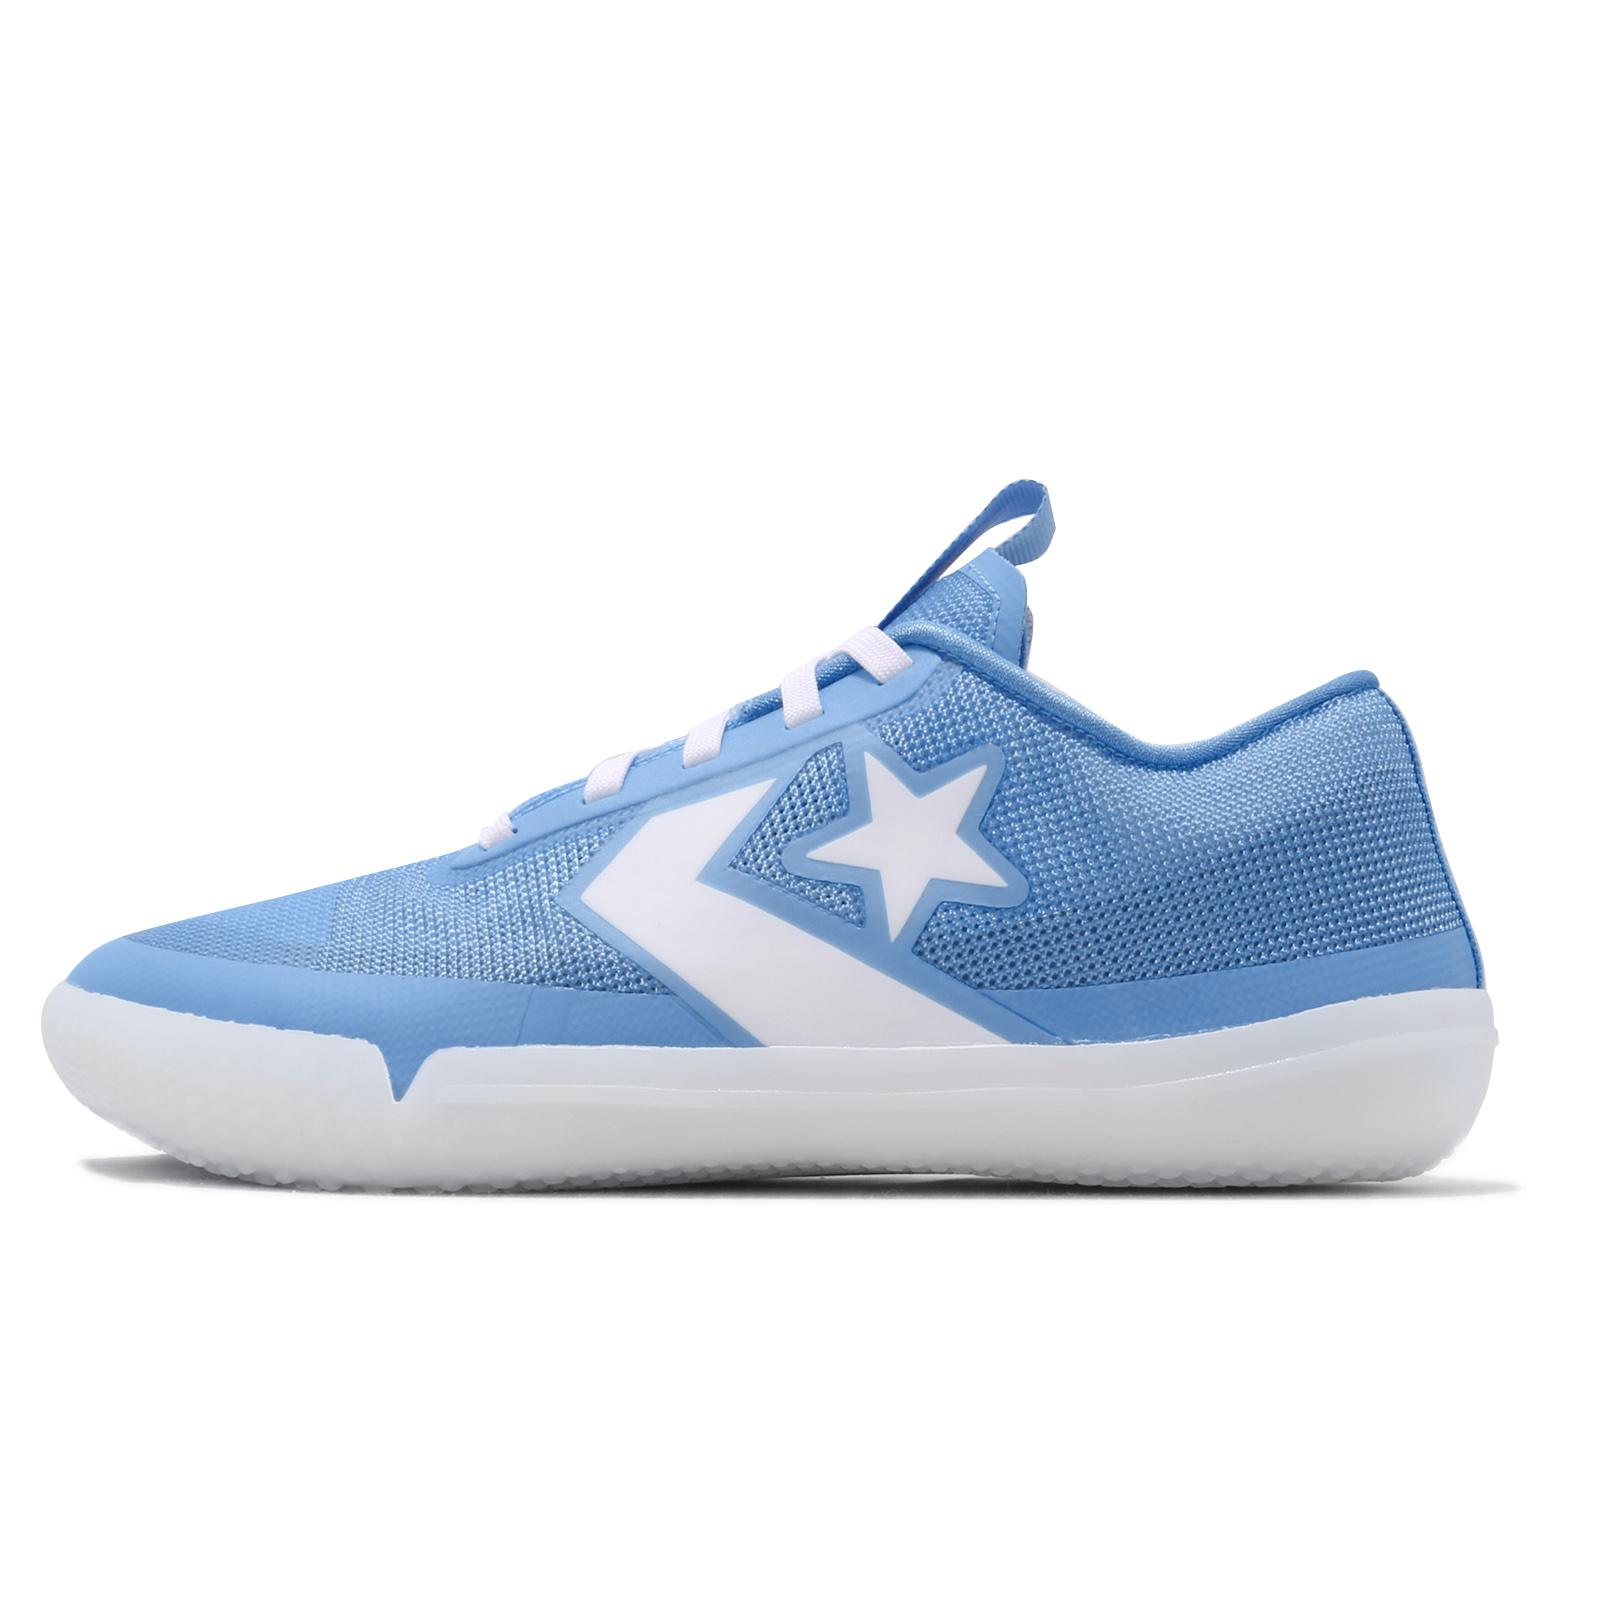 Converse 籃球鞋 All Star Pro BB Solstice 藍 白 男鞋 星星【ACS】 167937C